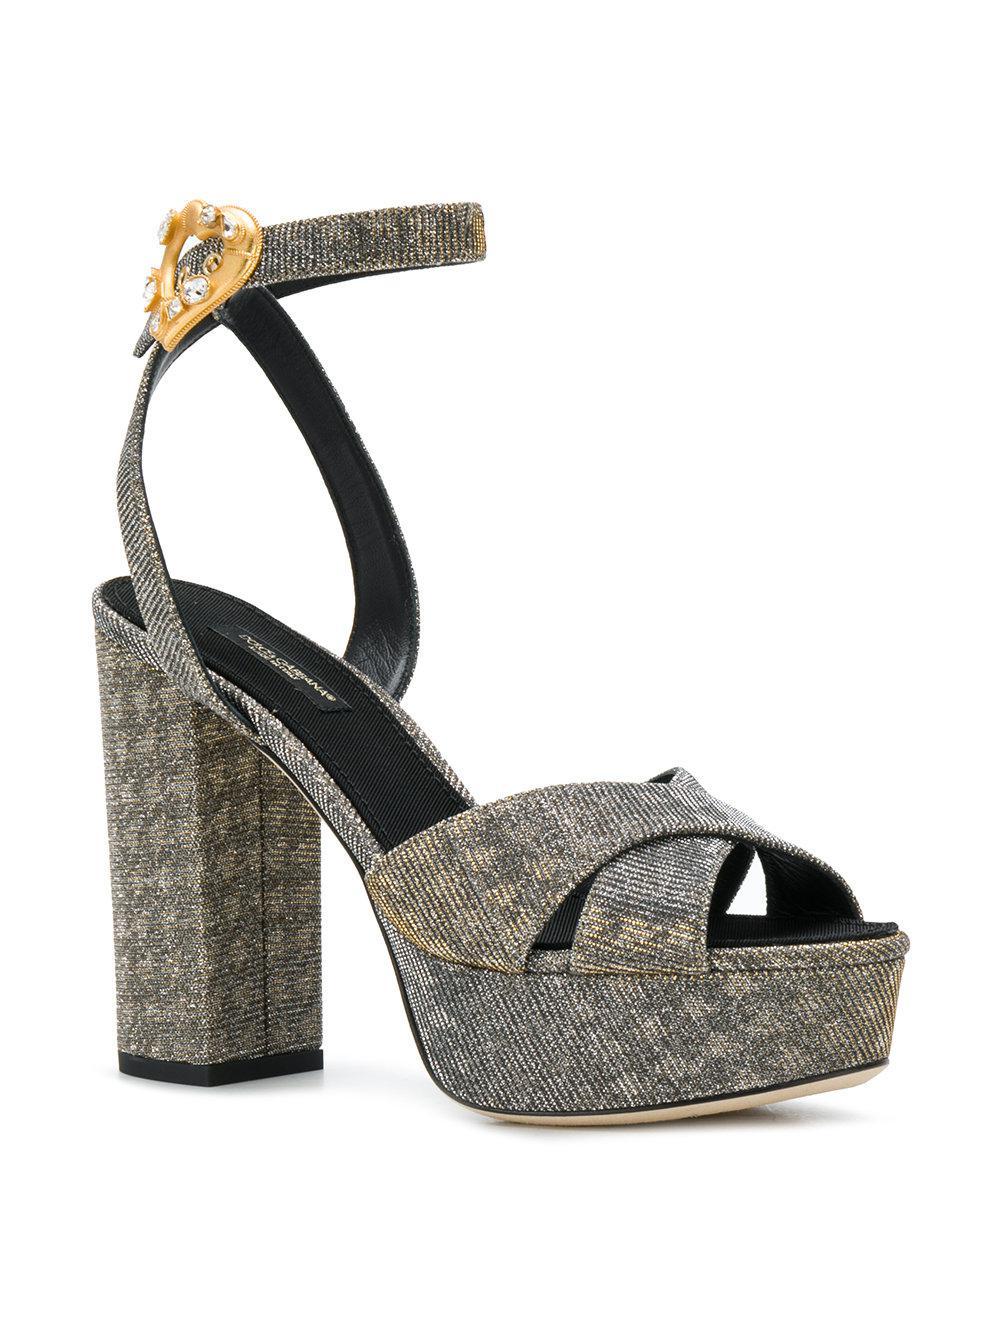 ccd1dcc0080f Lyst - Dolce   Gabbana Platform Ankle Strap Sandals in Metallic - Save 52%